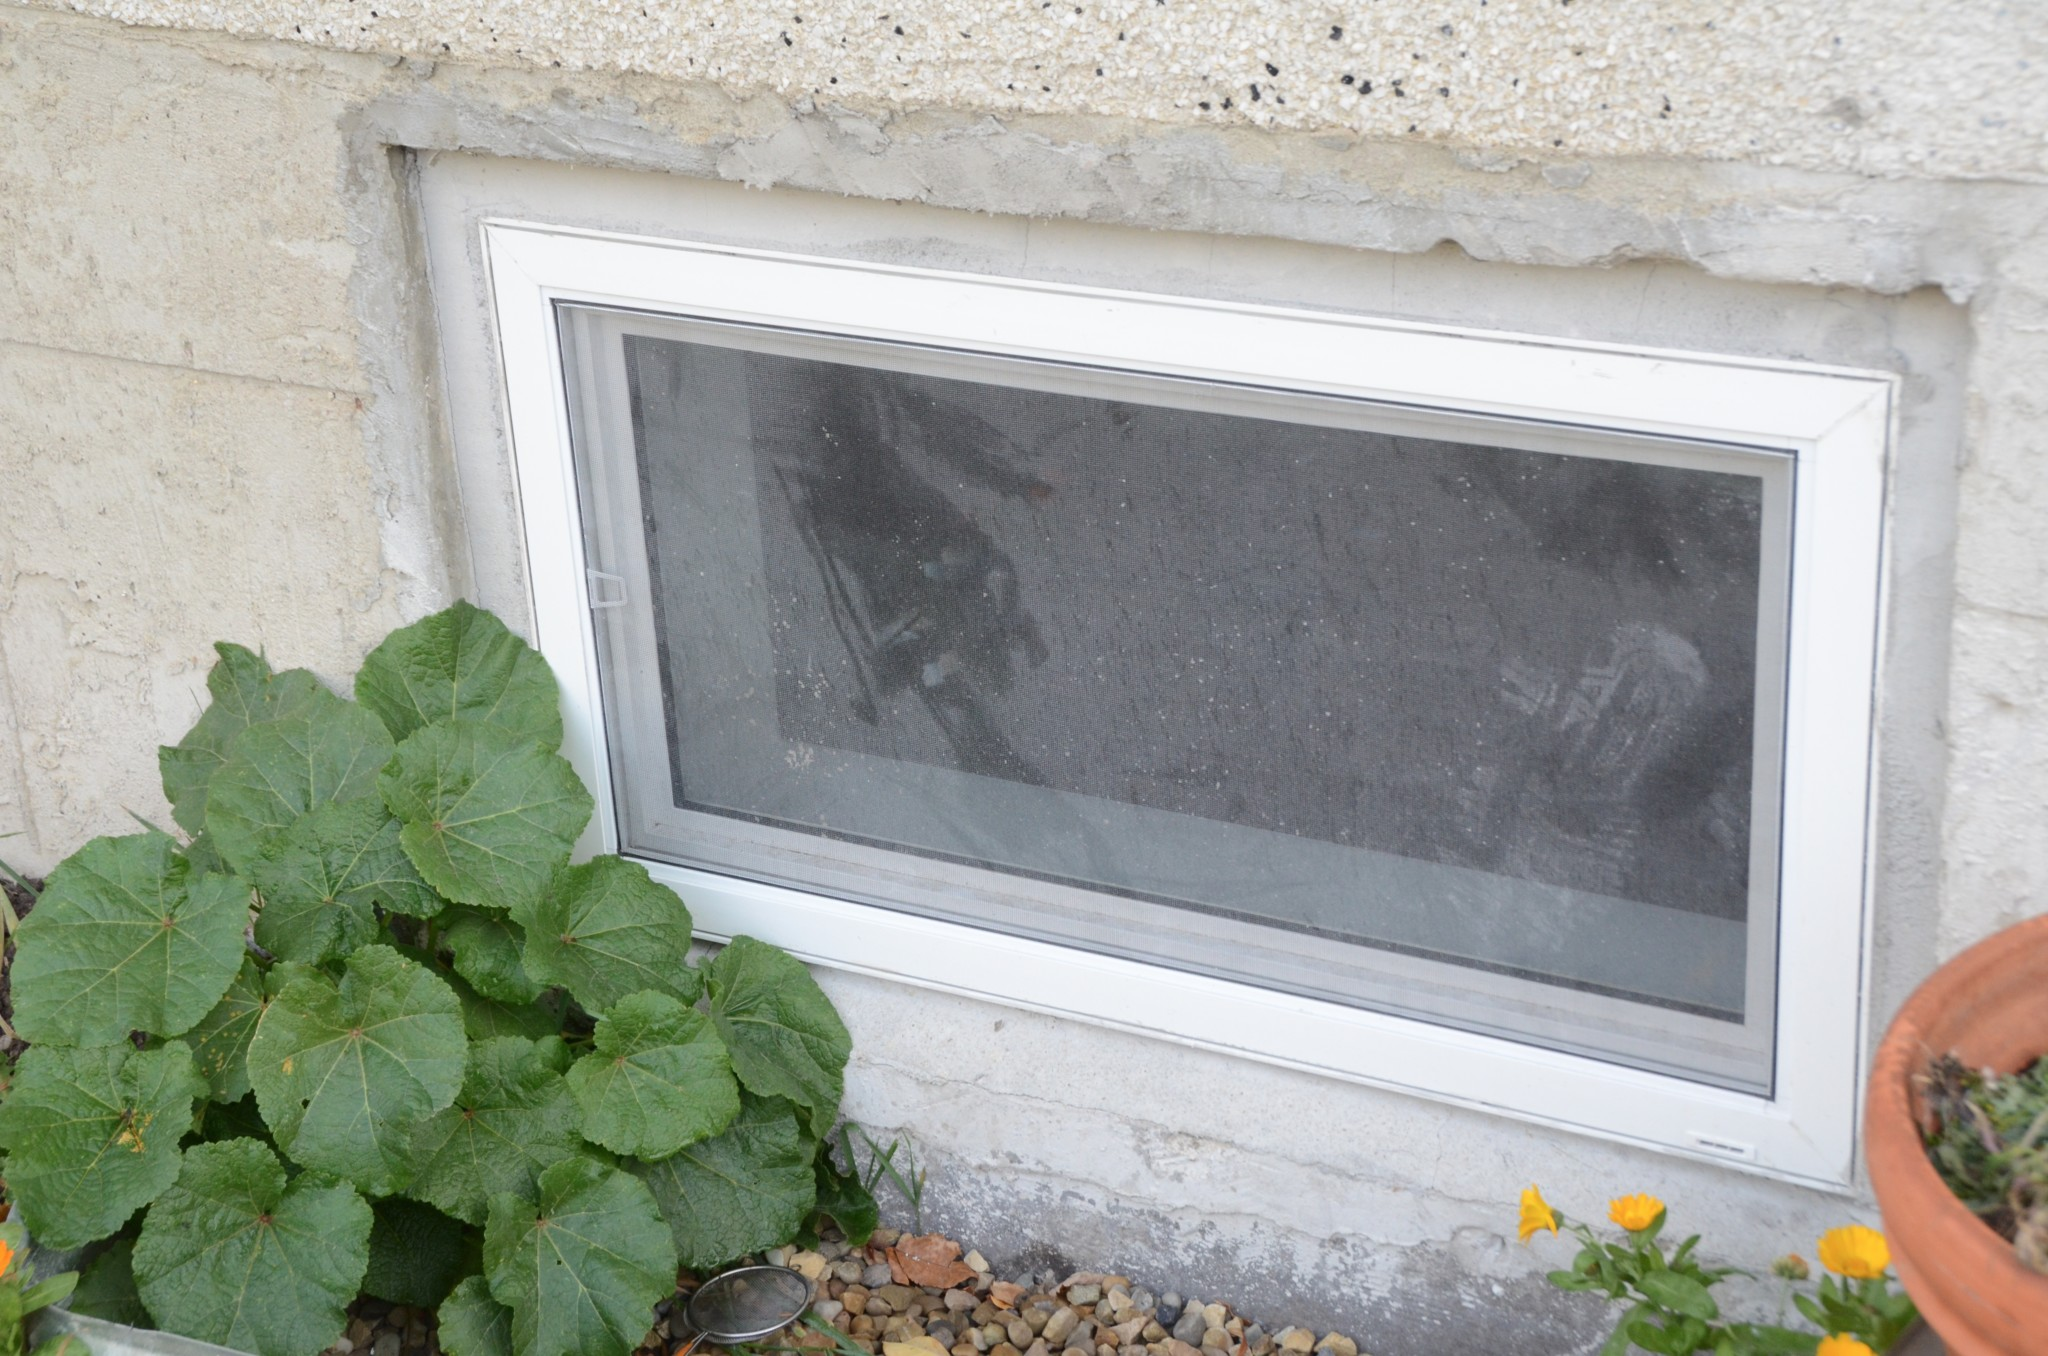 05-13307 Window